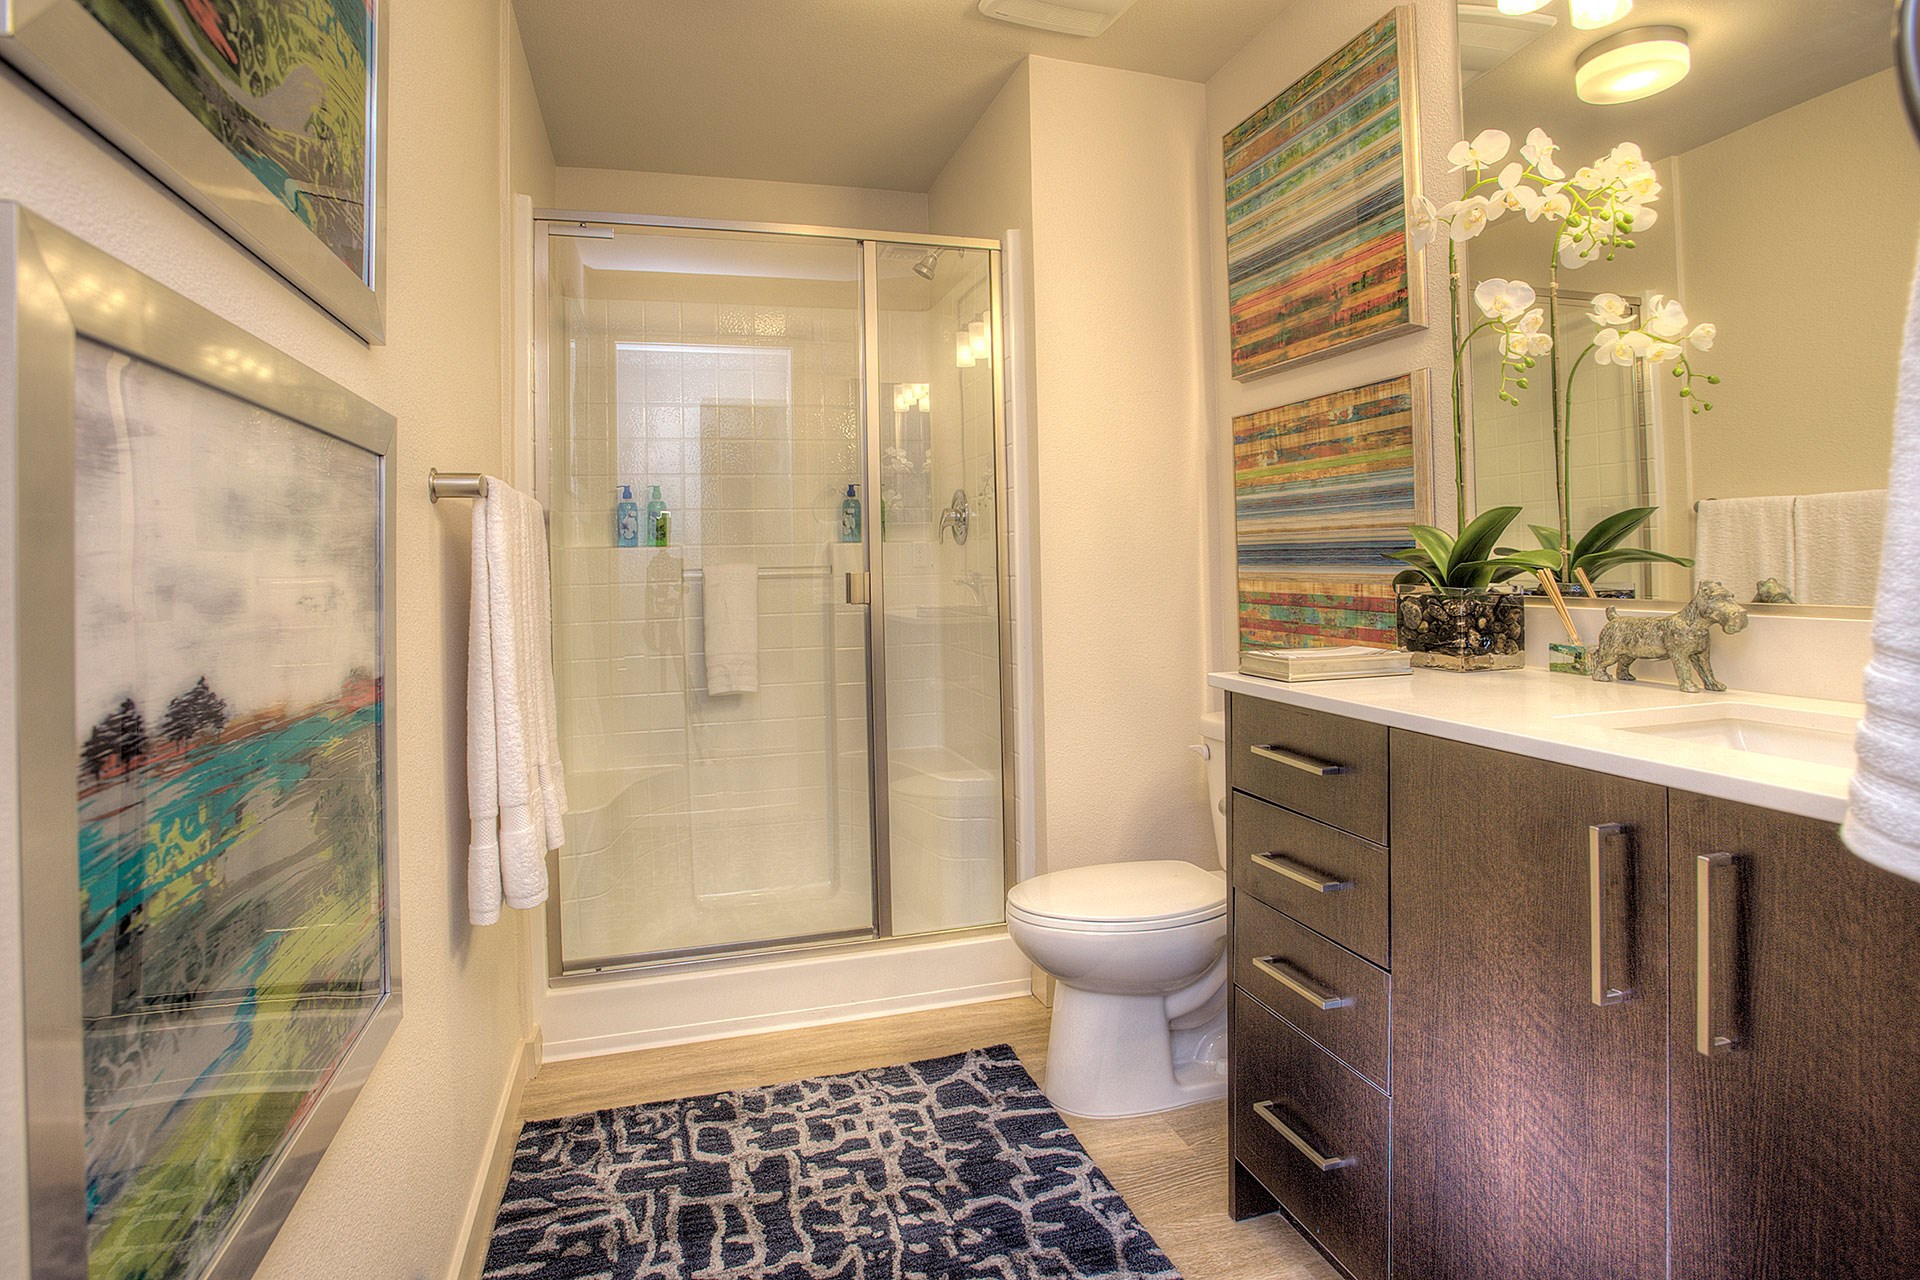 Designer Cabinets & Countertops